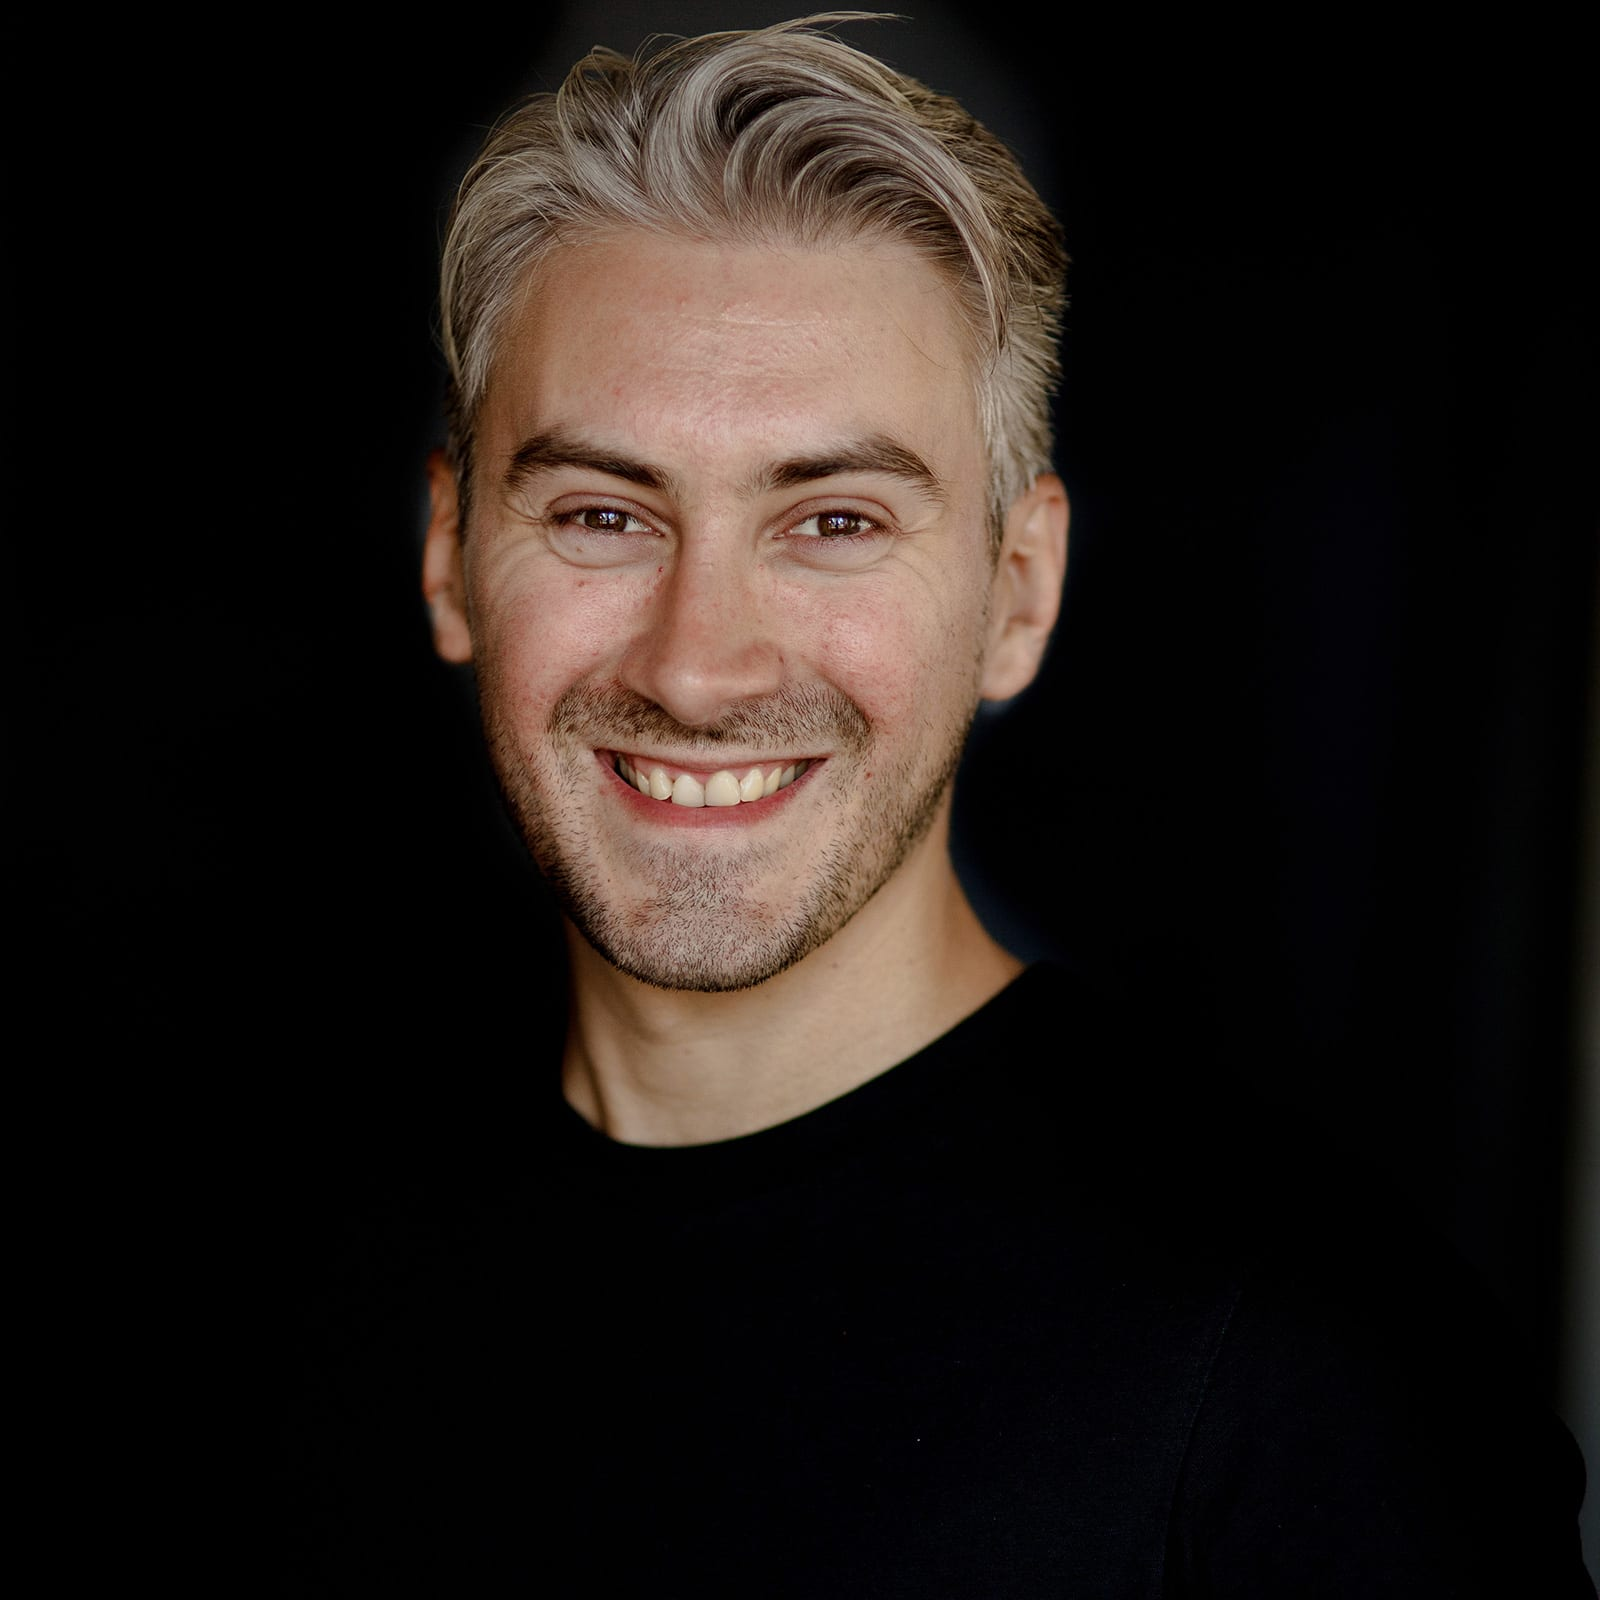 Noortje Witteveen Creative Director & Co-Owner Handed By